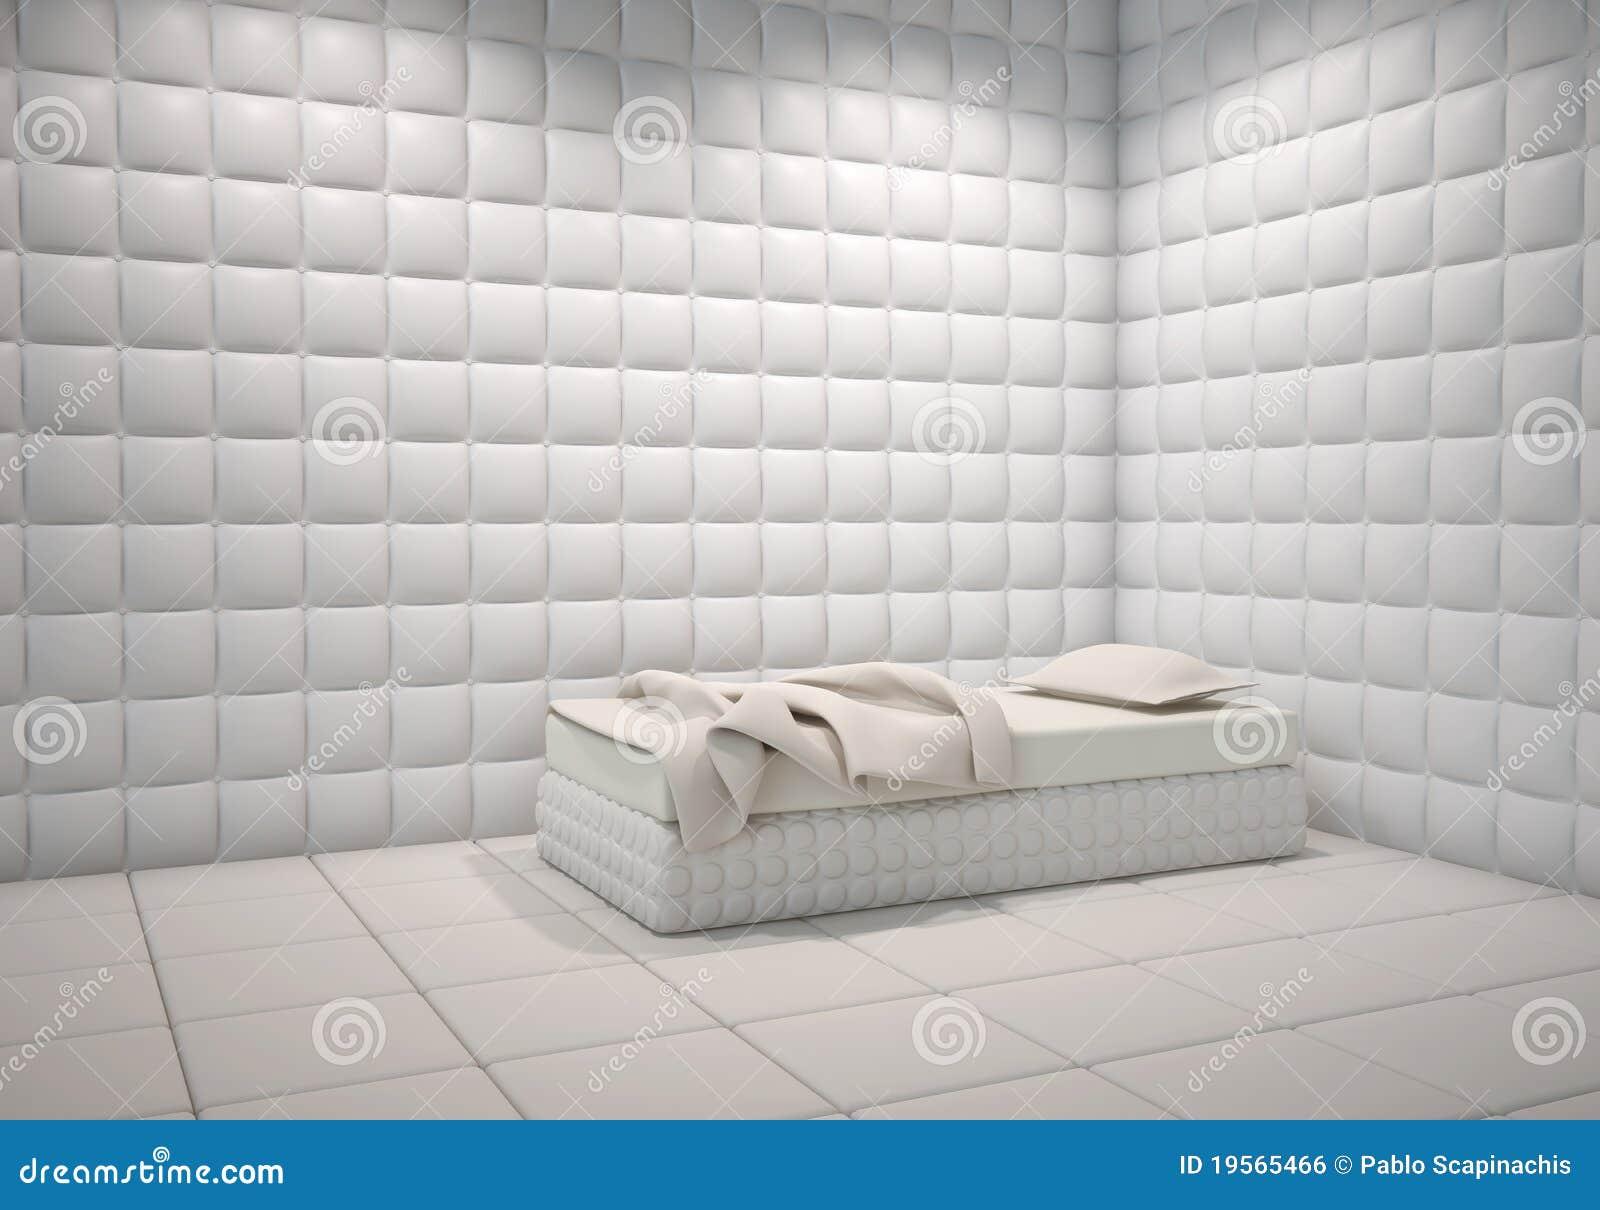 Mental Hospital Padded Room Royalty Free Stock Image ...